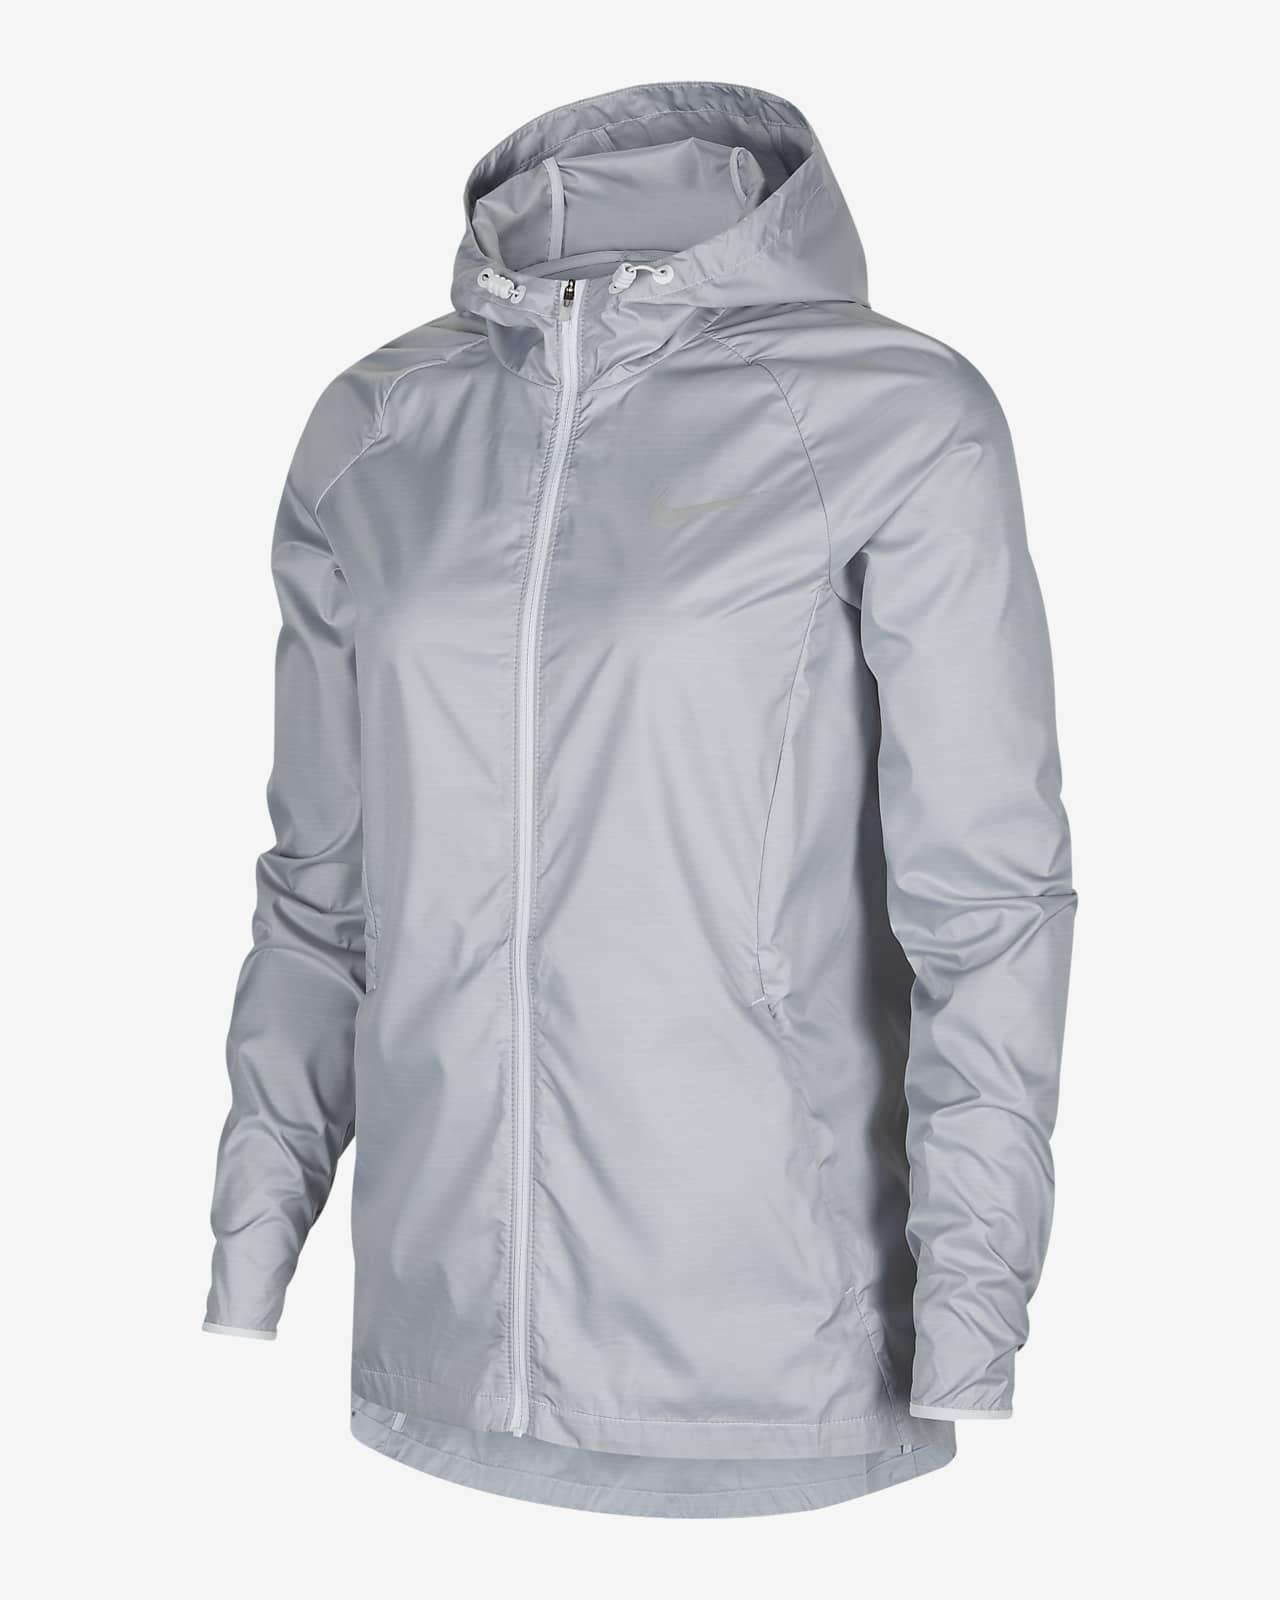 Nike Essential 女子连帽跑步夹克